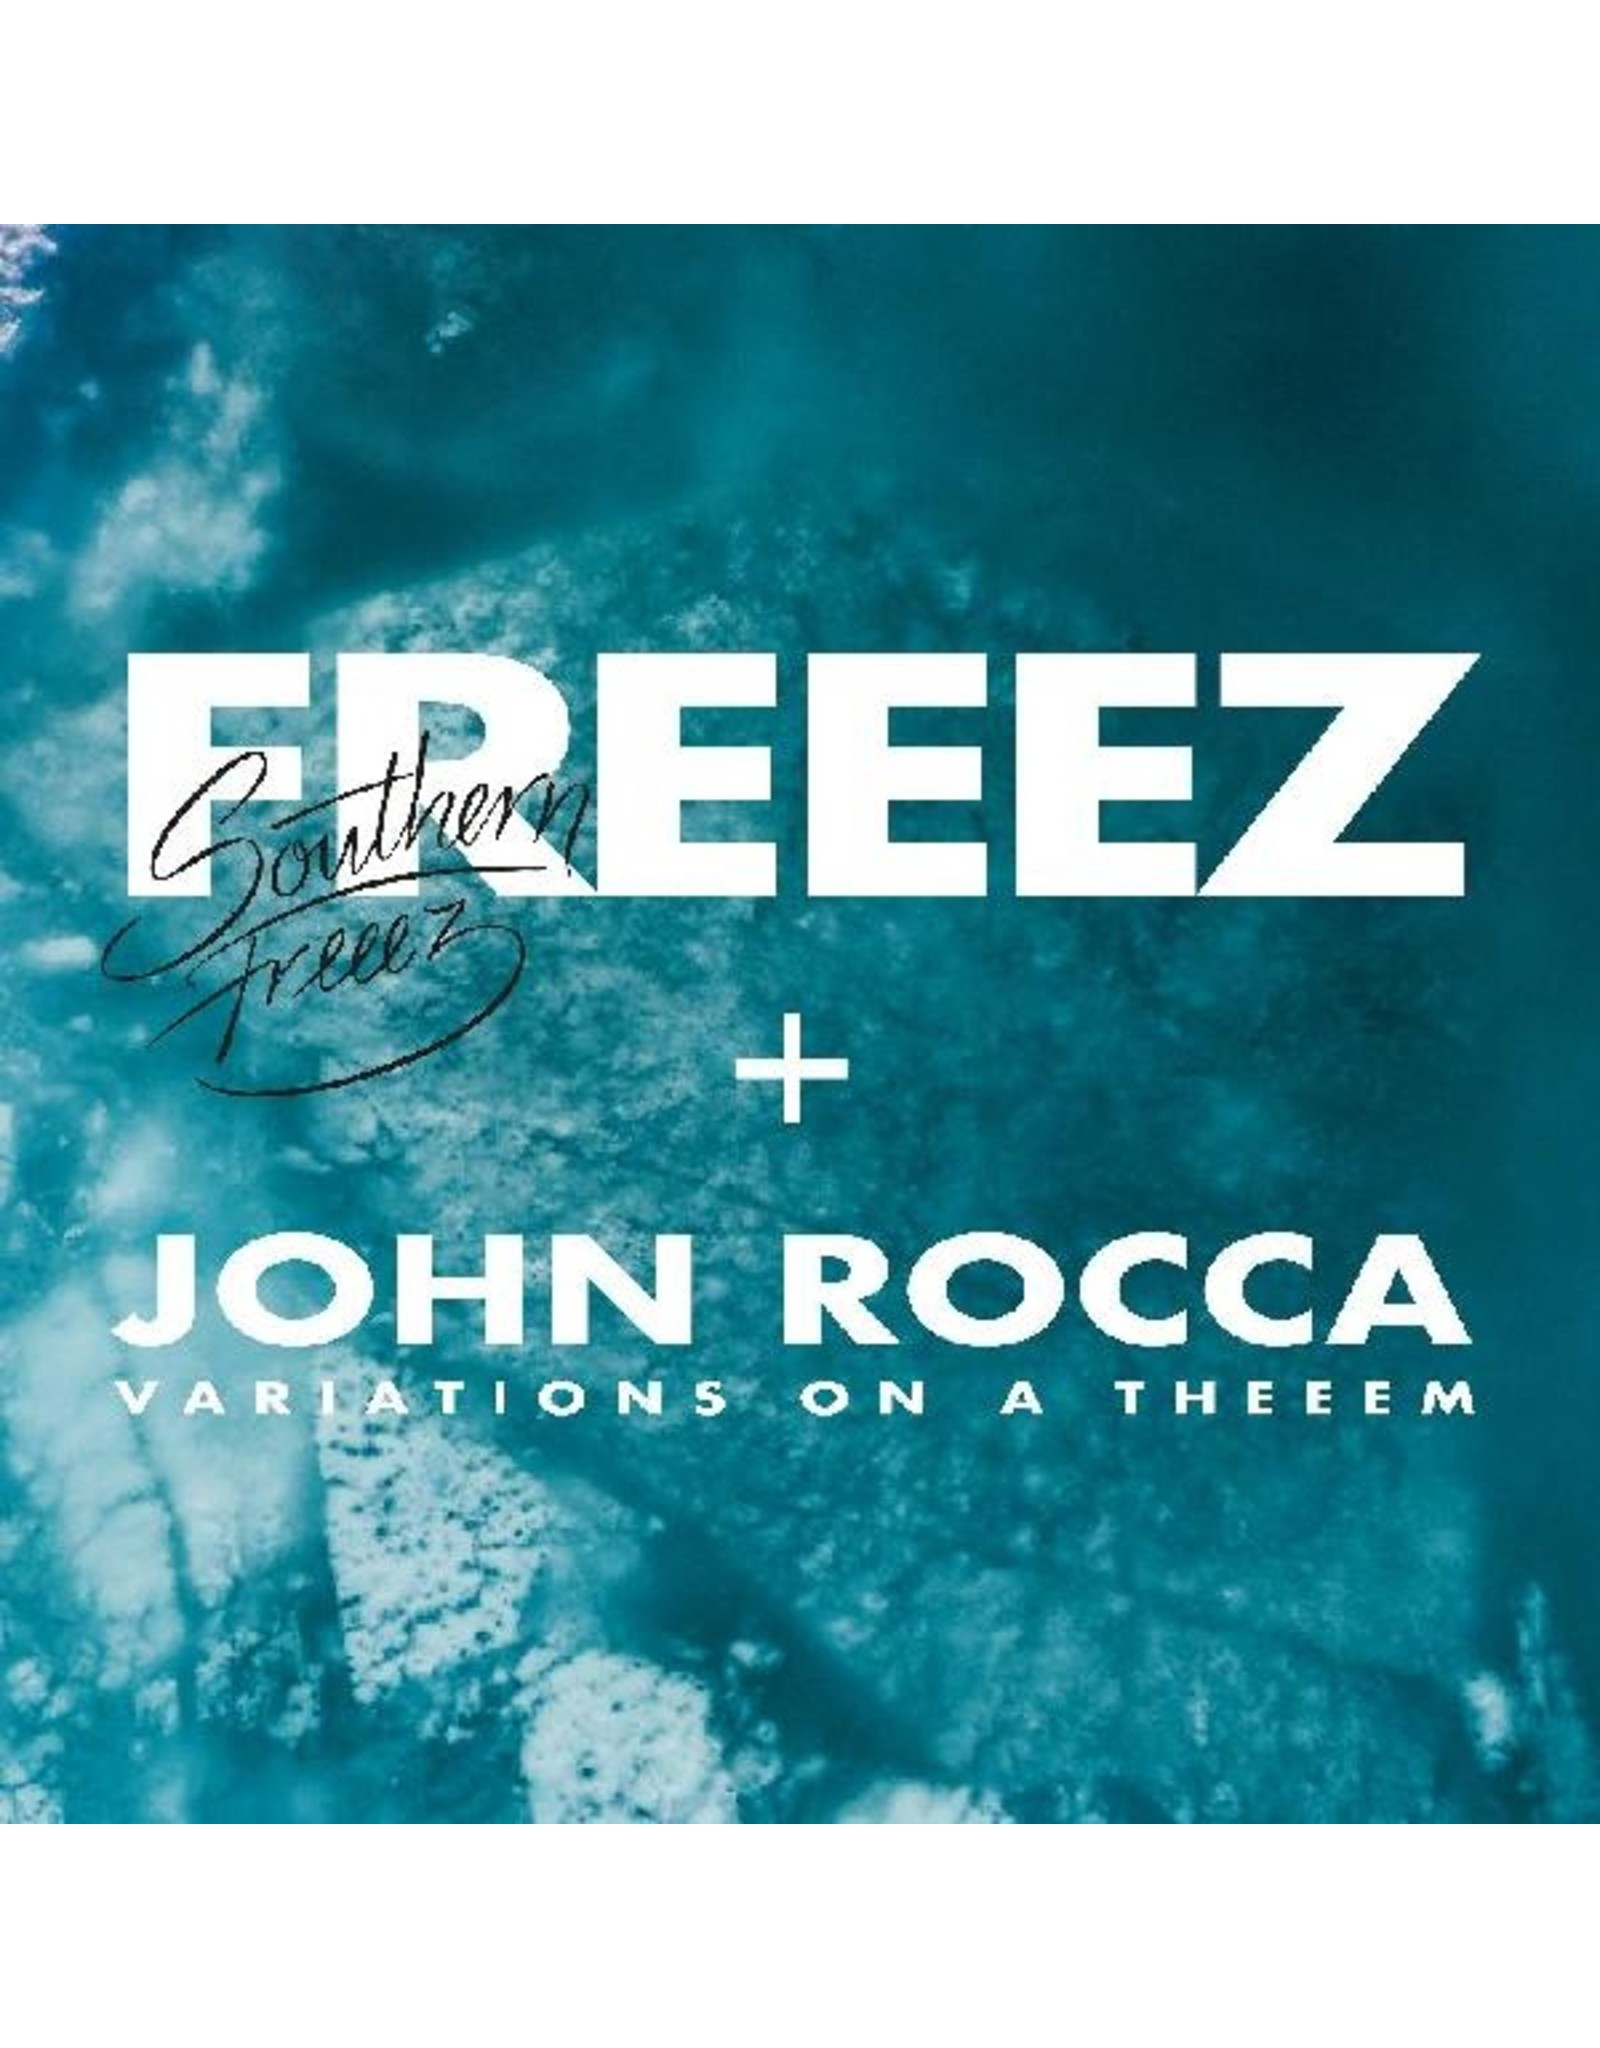 New Vinyl Freeez & John Rocca - Southern Freeez // Variations On A Theme 2LP